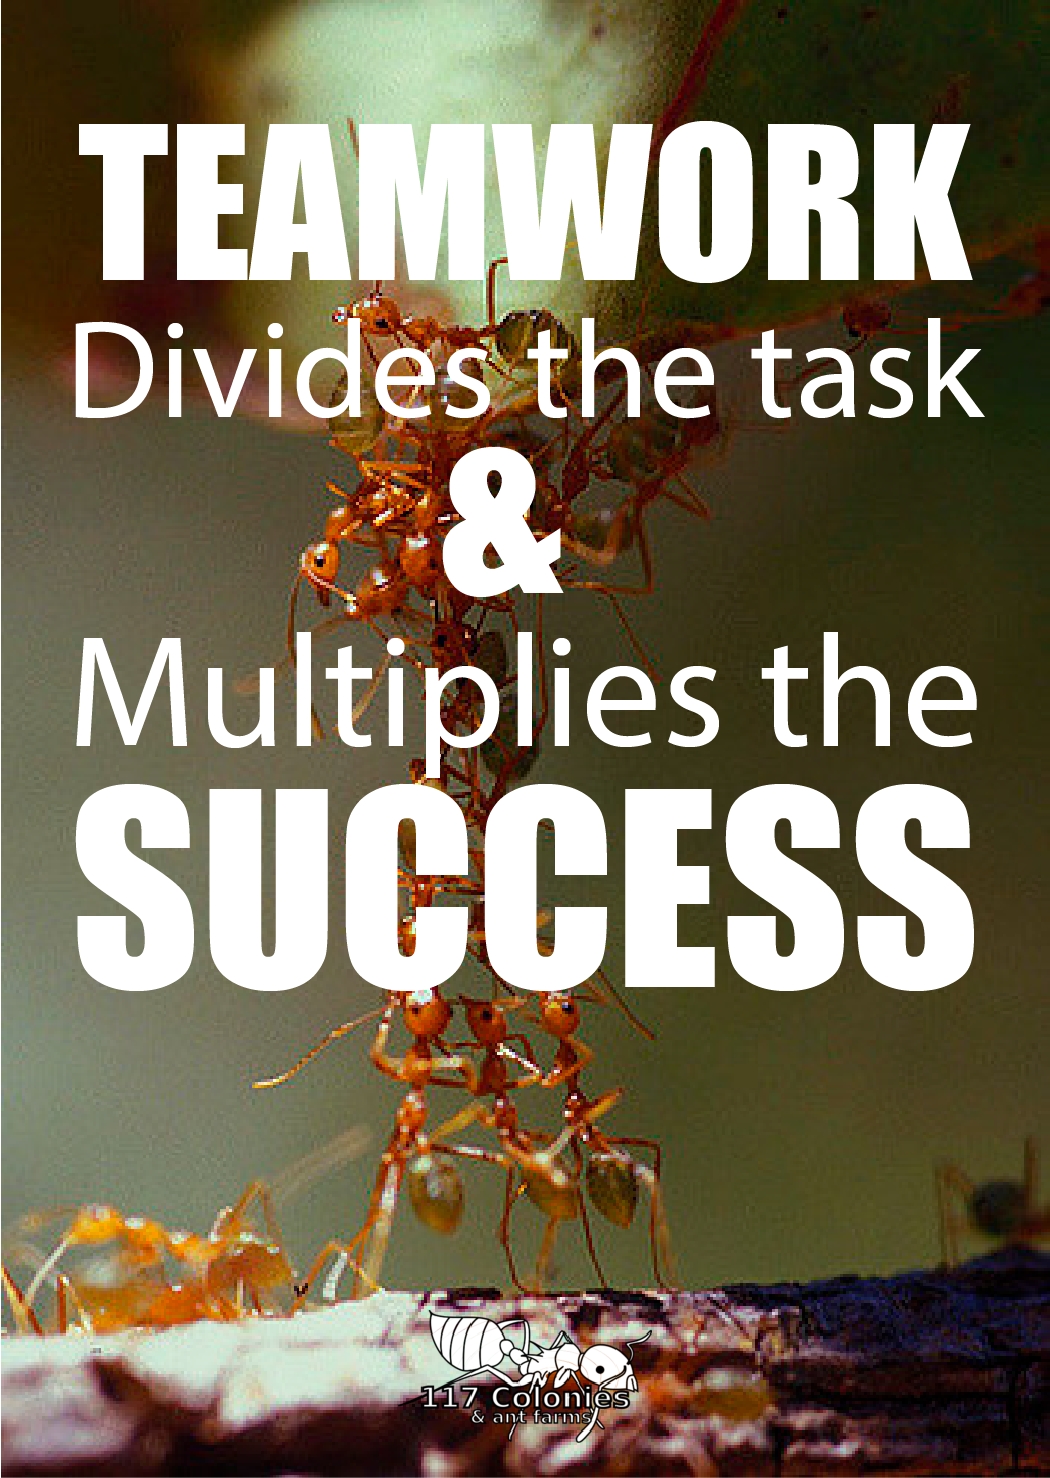 Teamwork divides the task & Multiplies Success. Ants